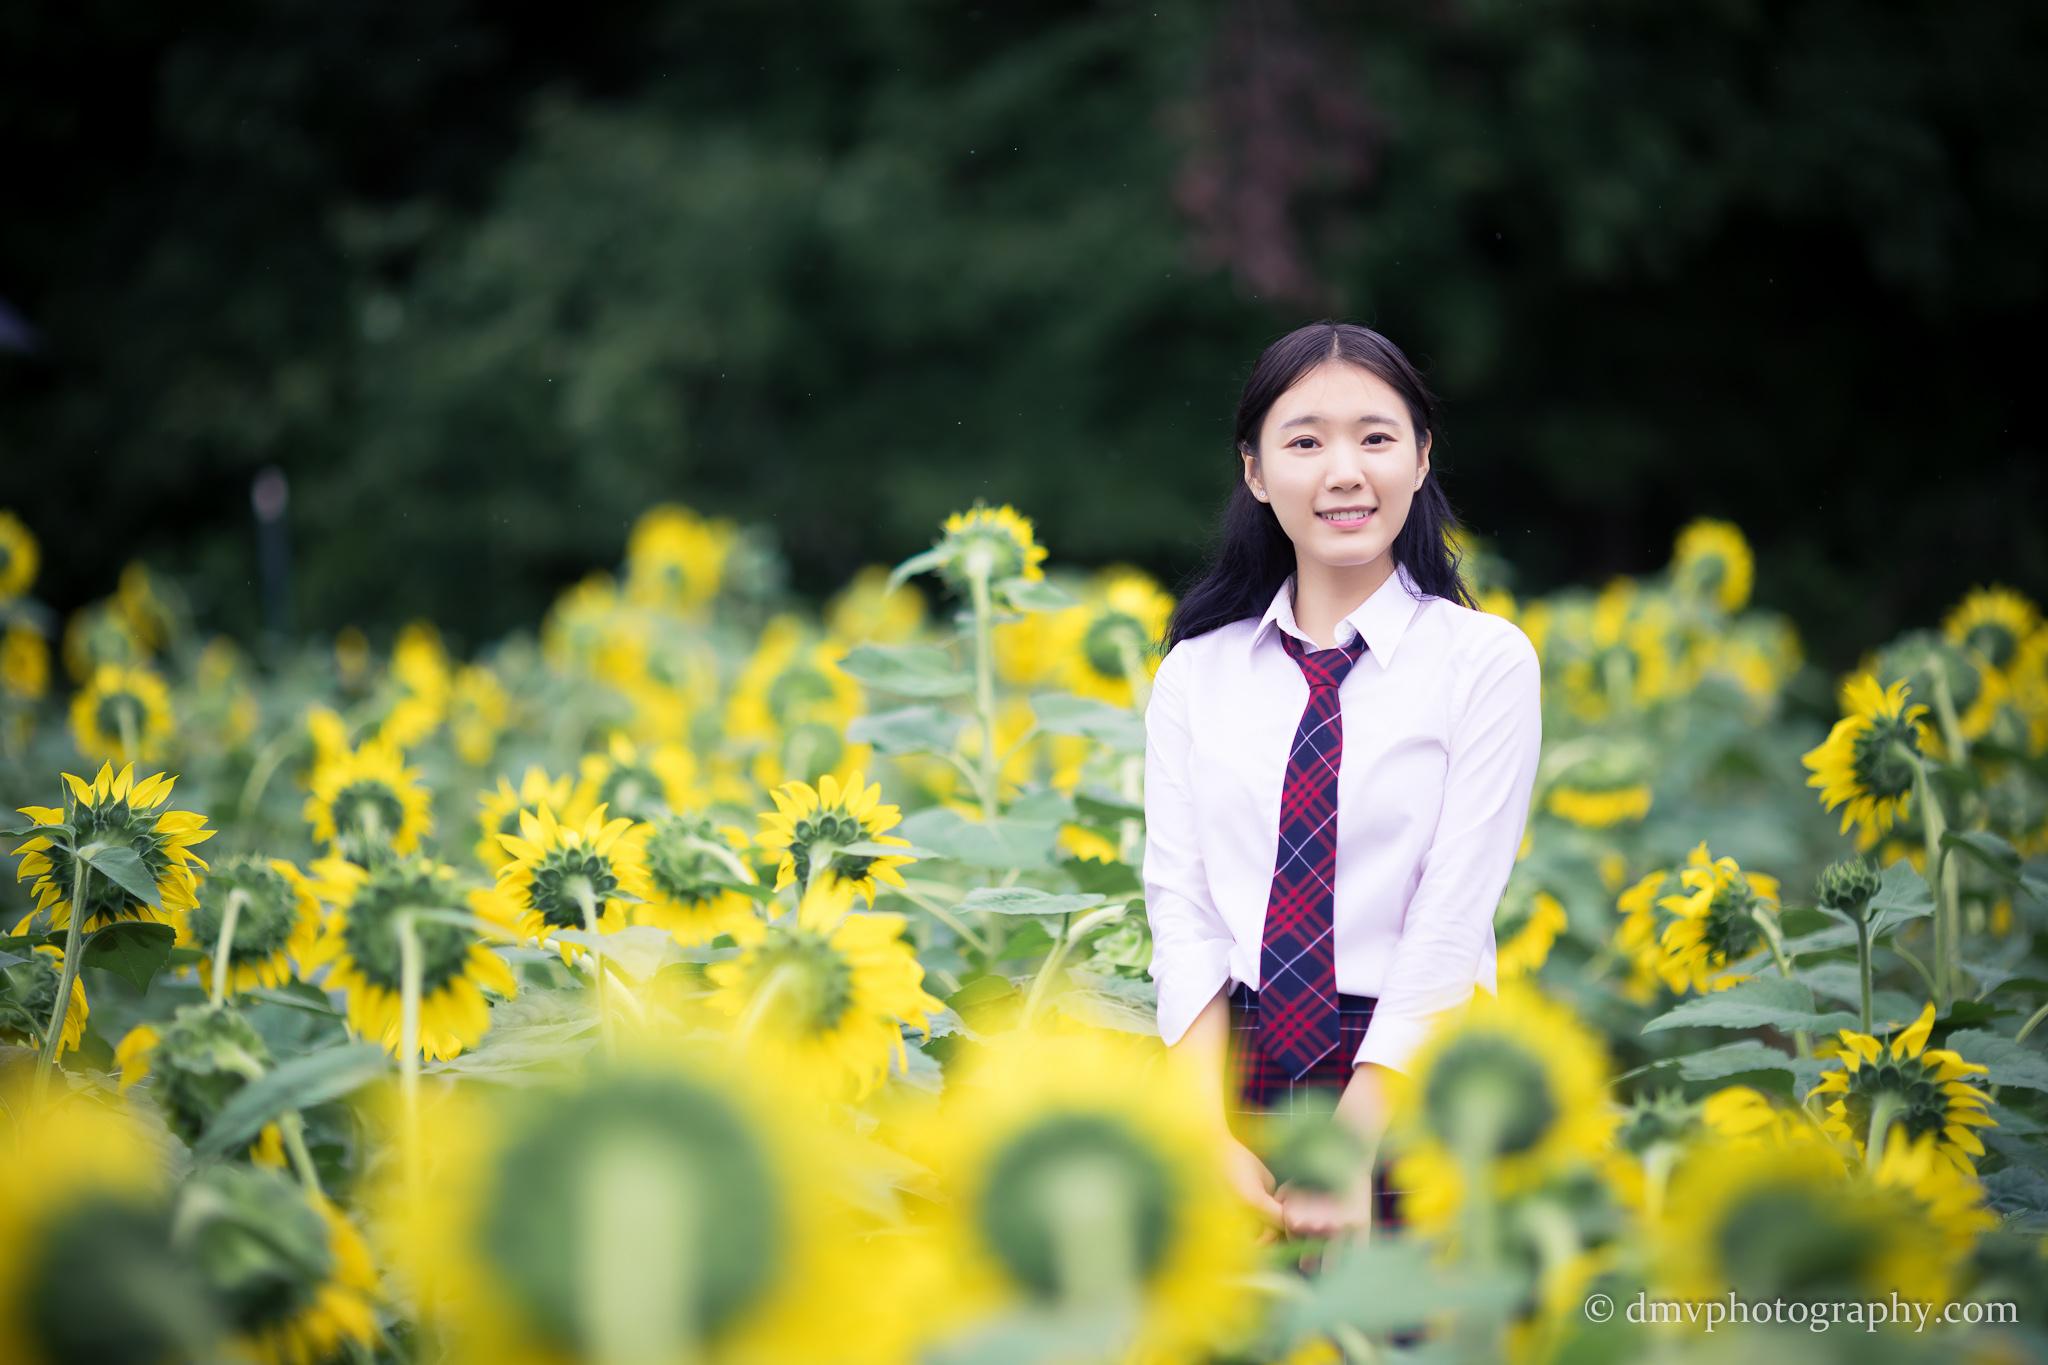 2017-07-29 - Yu Jie Sunflower - 00031